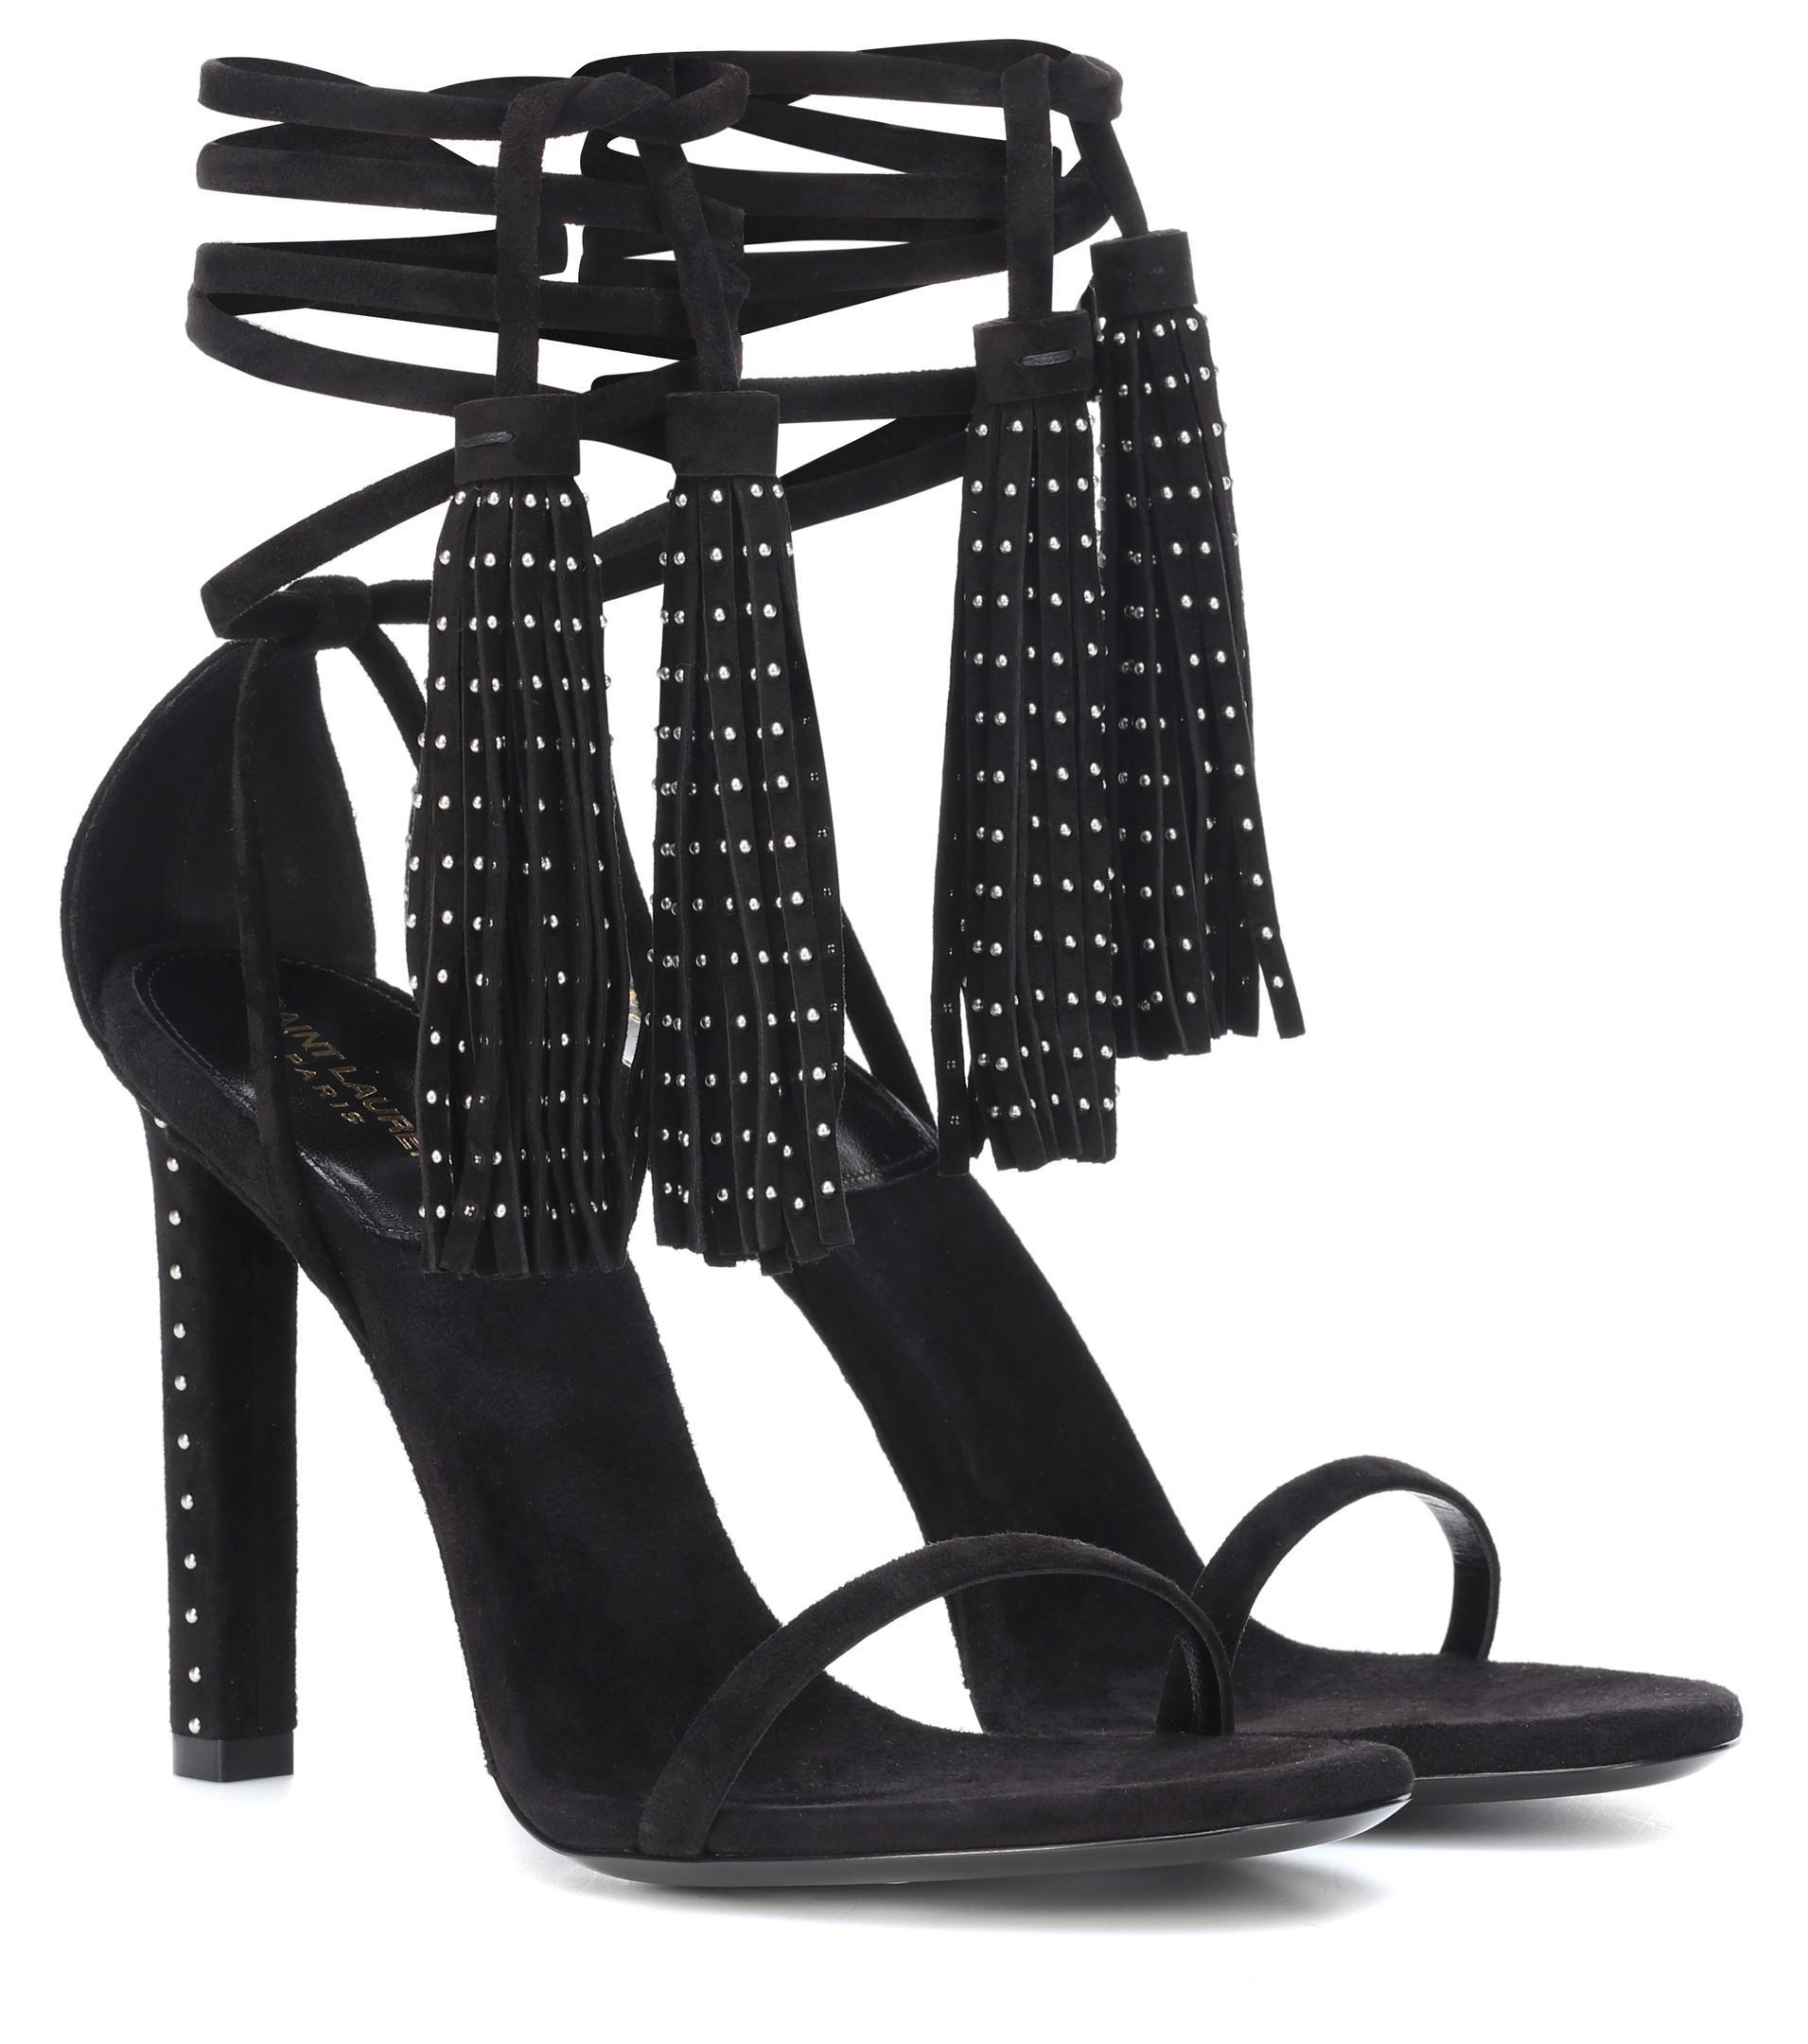 a5e29553582c Saint Laurent Linn Embellished Suede Sandals in Black - Lyst